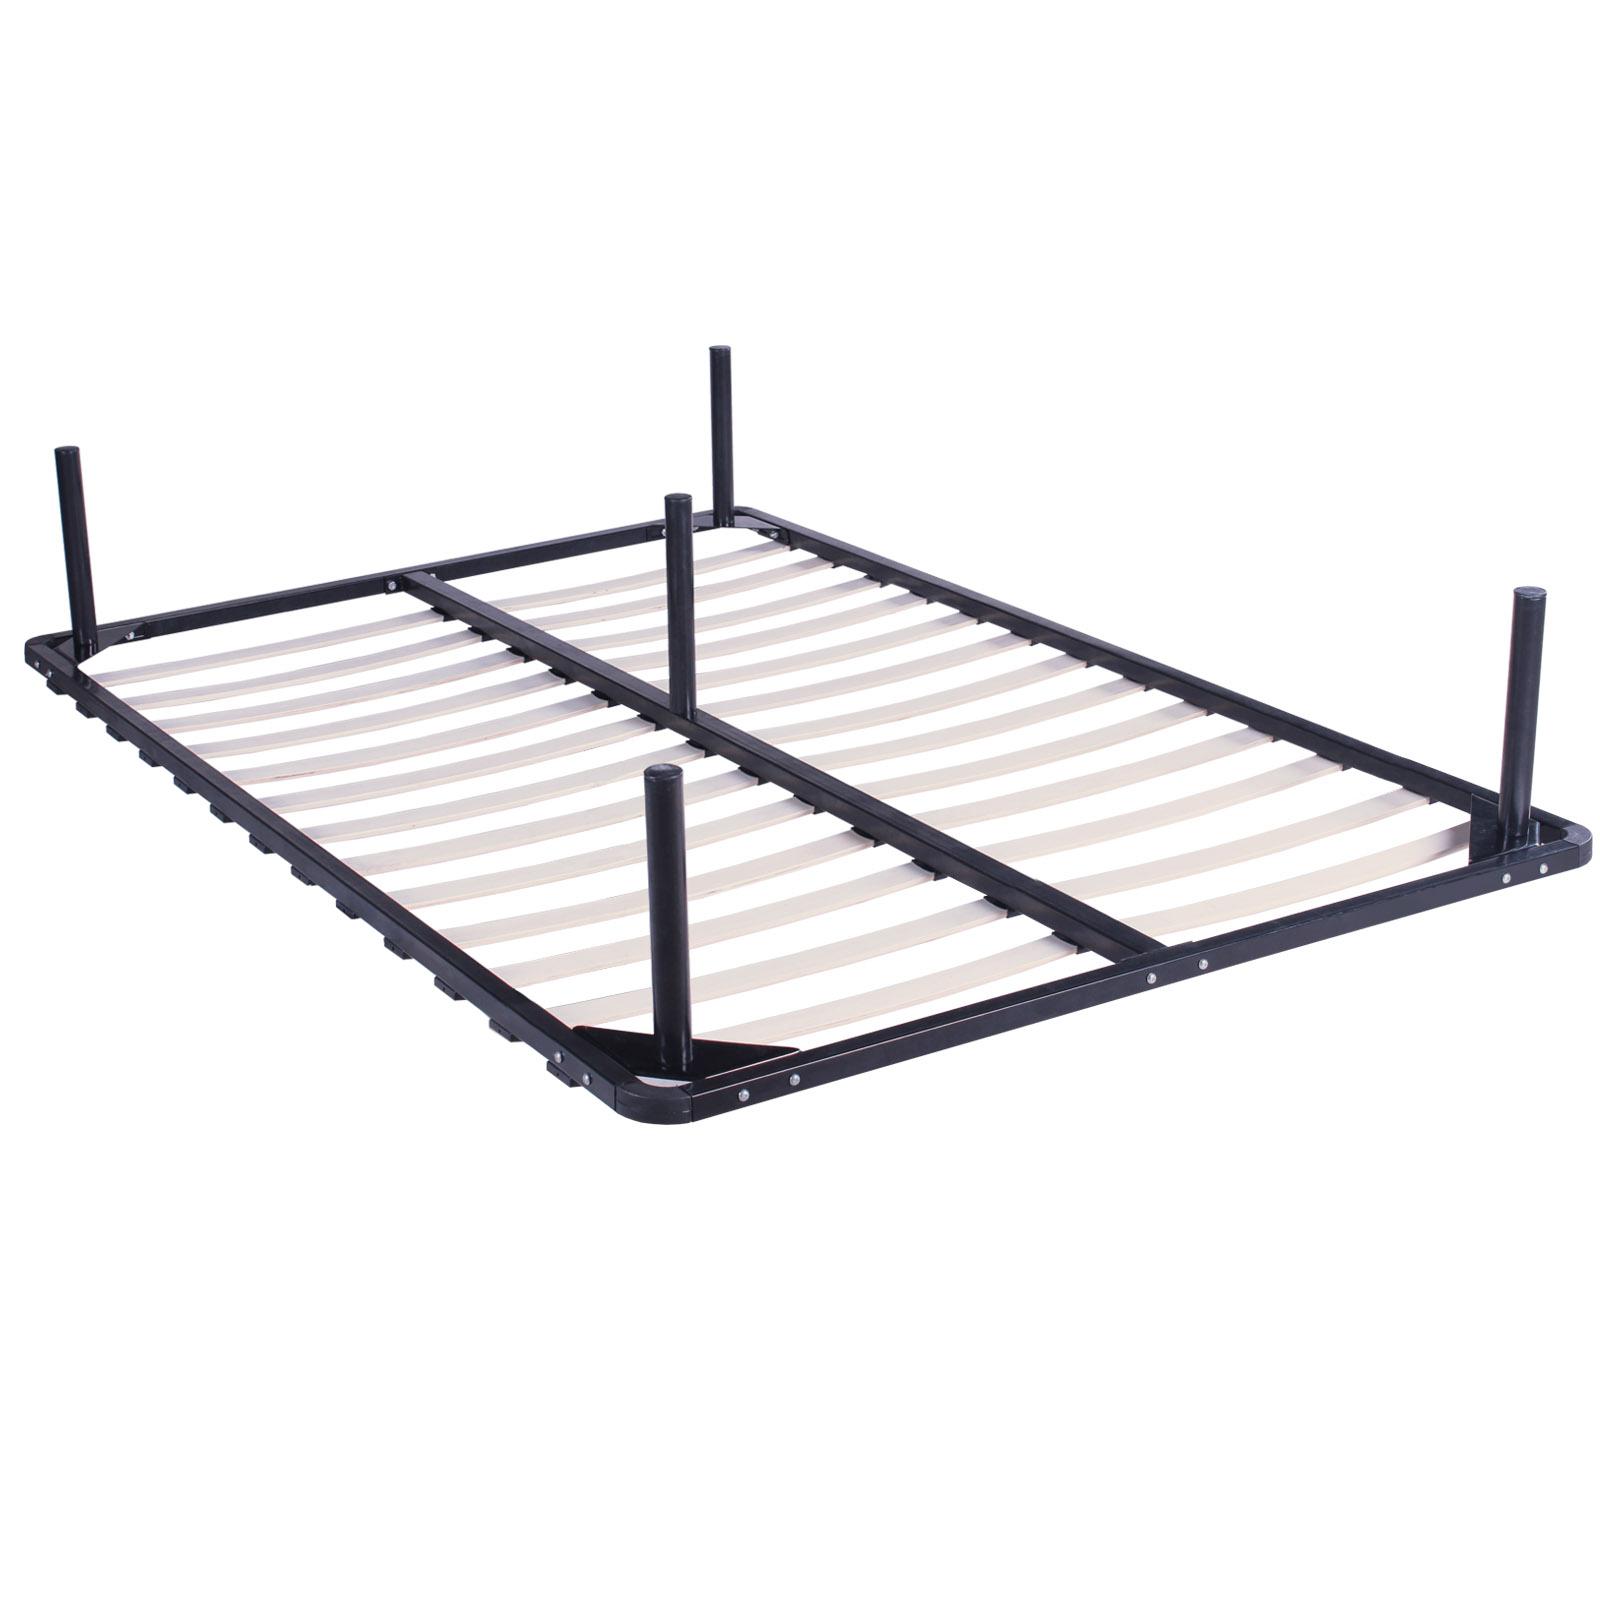 lit en m tal auszugsbett lit queen size assembler double lit adolescent ebay. Black Bedroom Furniture Sets. Home Design Ideas